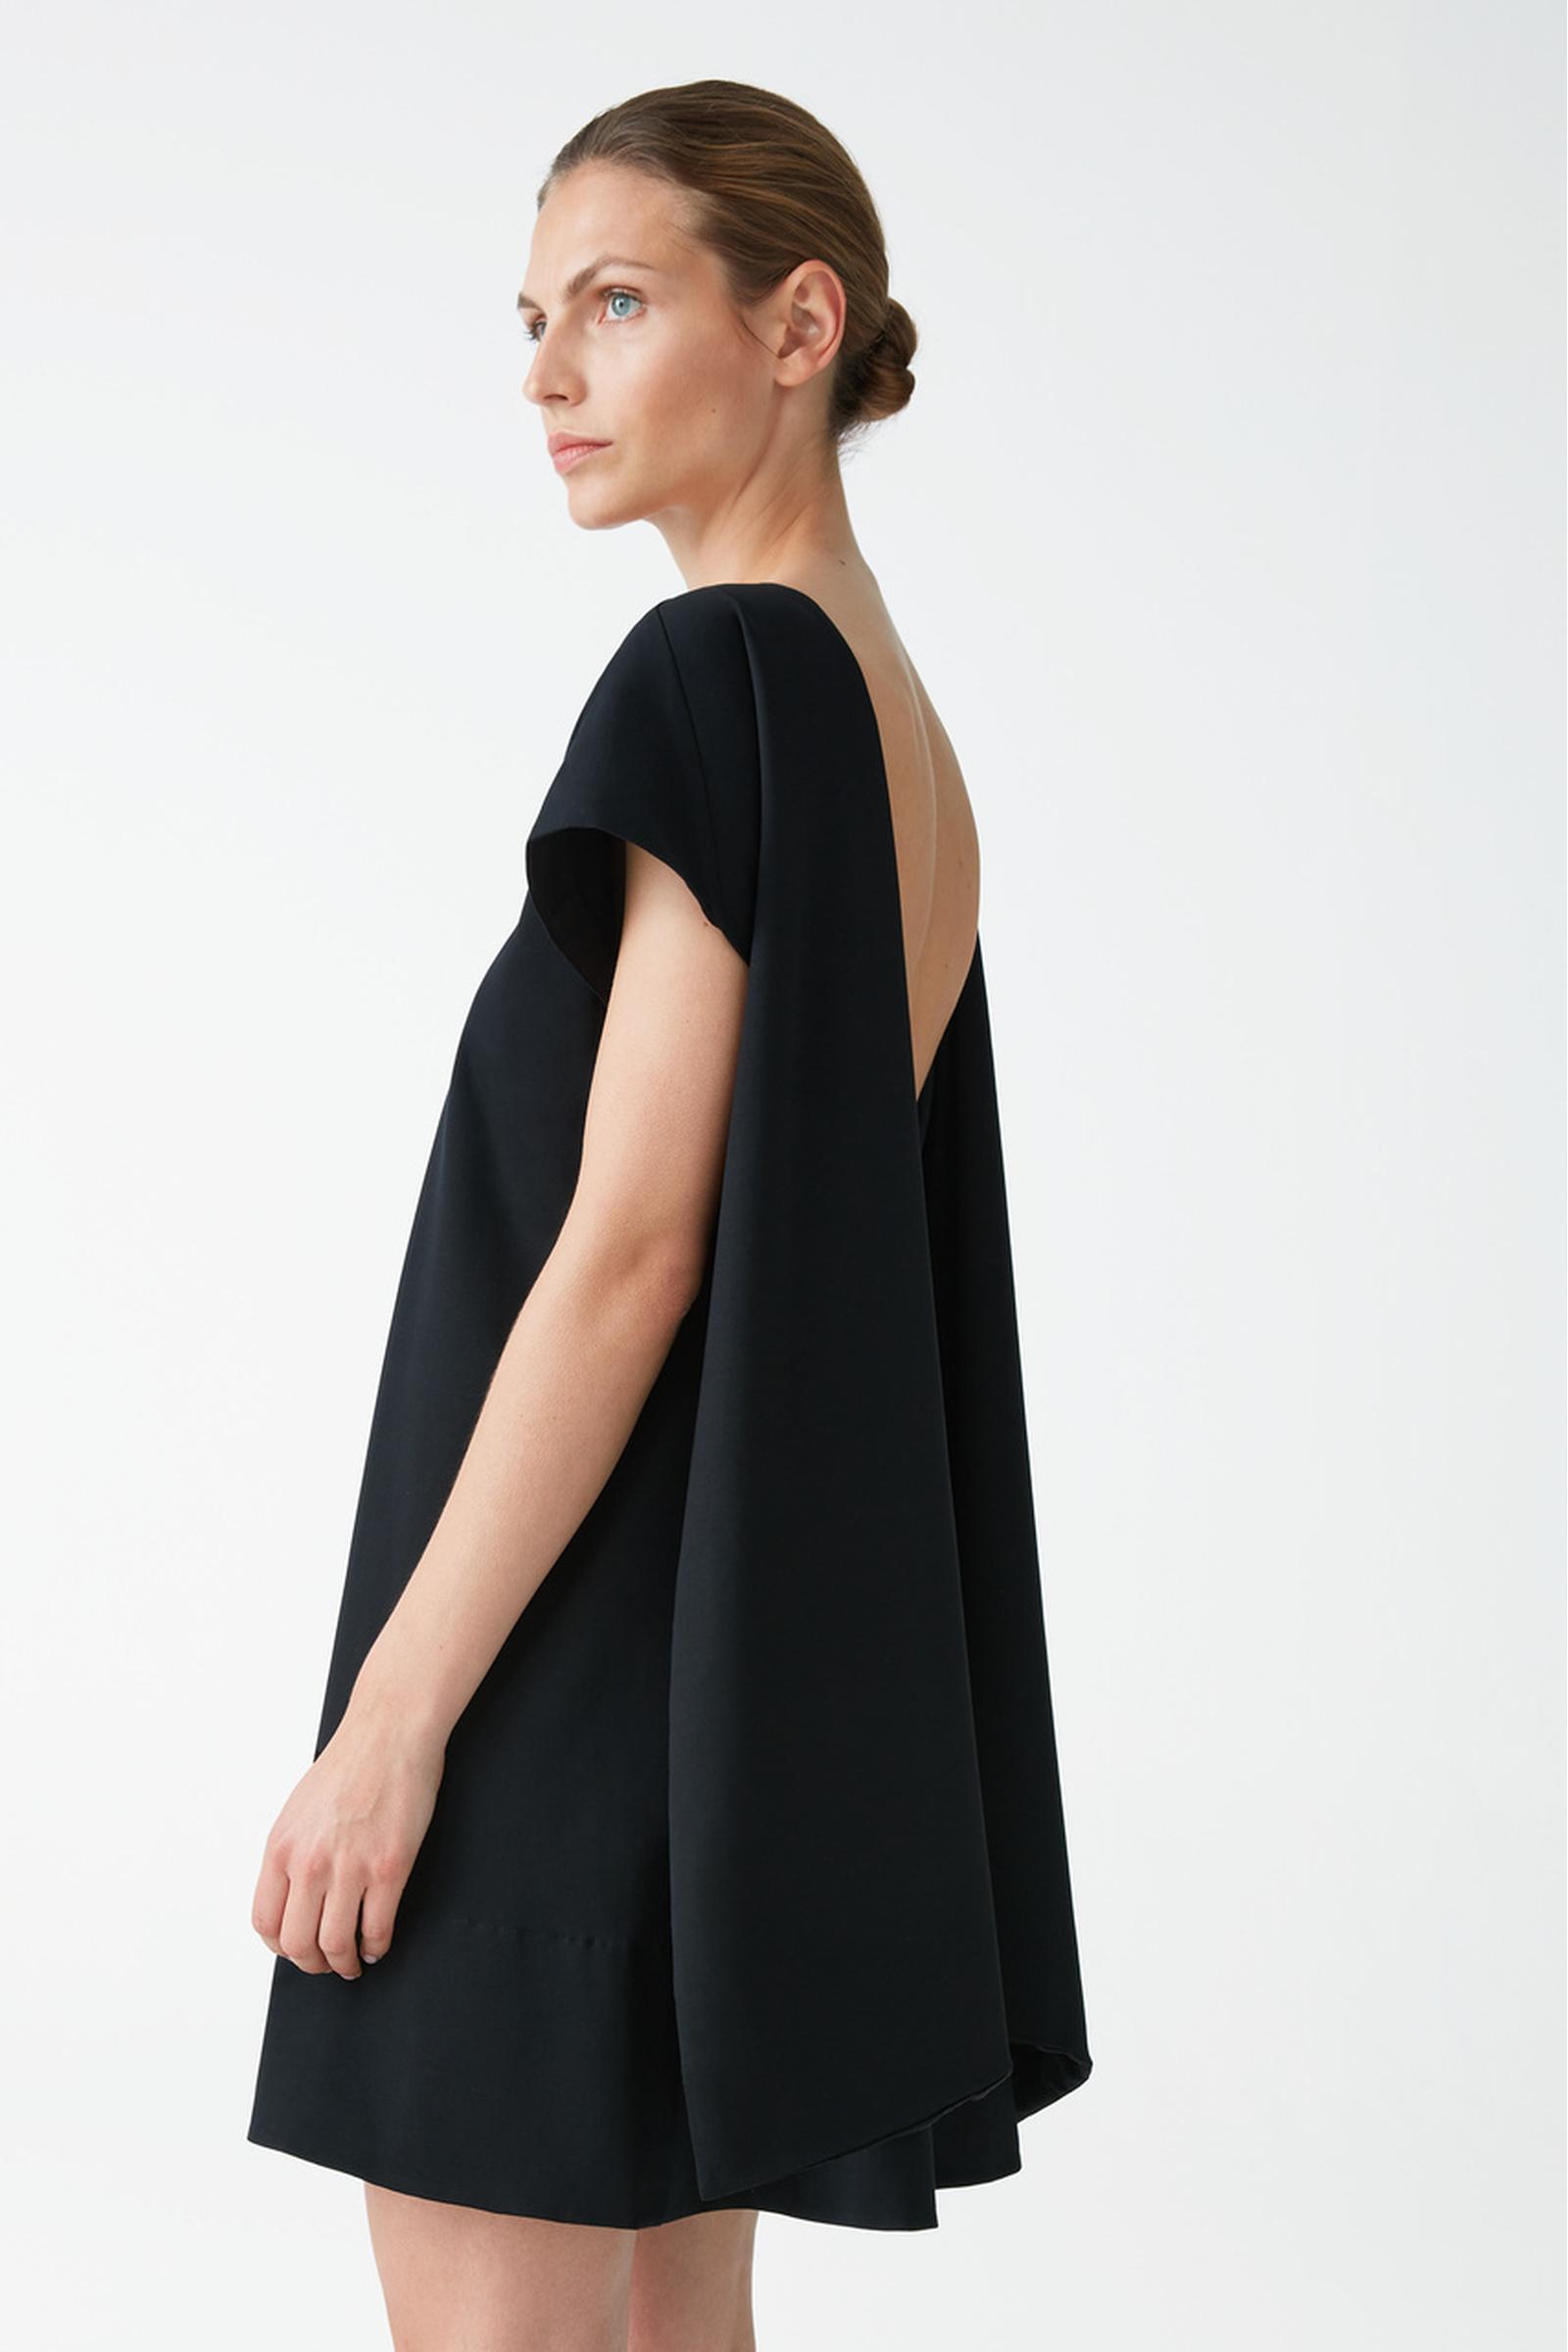 COS 오가닉 코튼 A라인 리버스 타이 드레스의 블랙컬러 ECOMLook입니다.